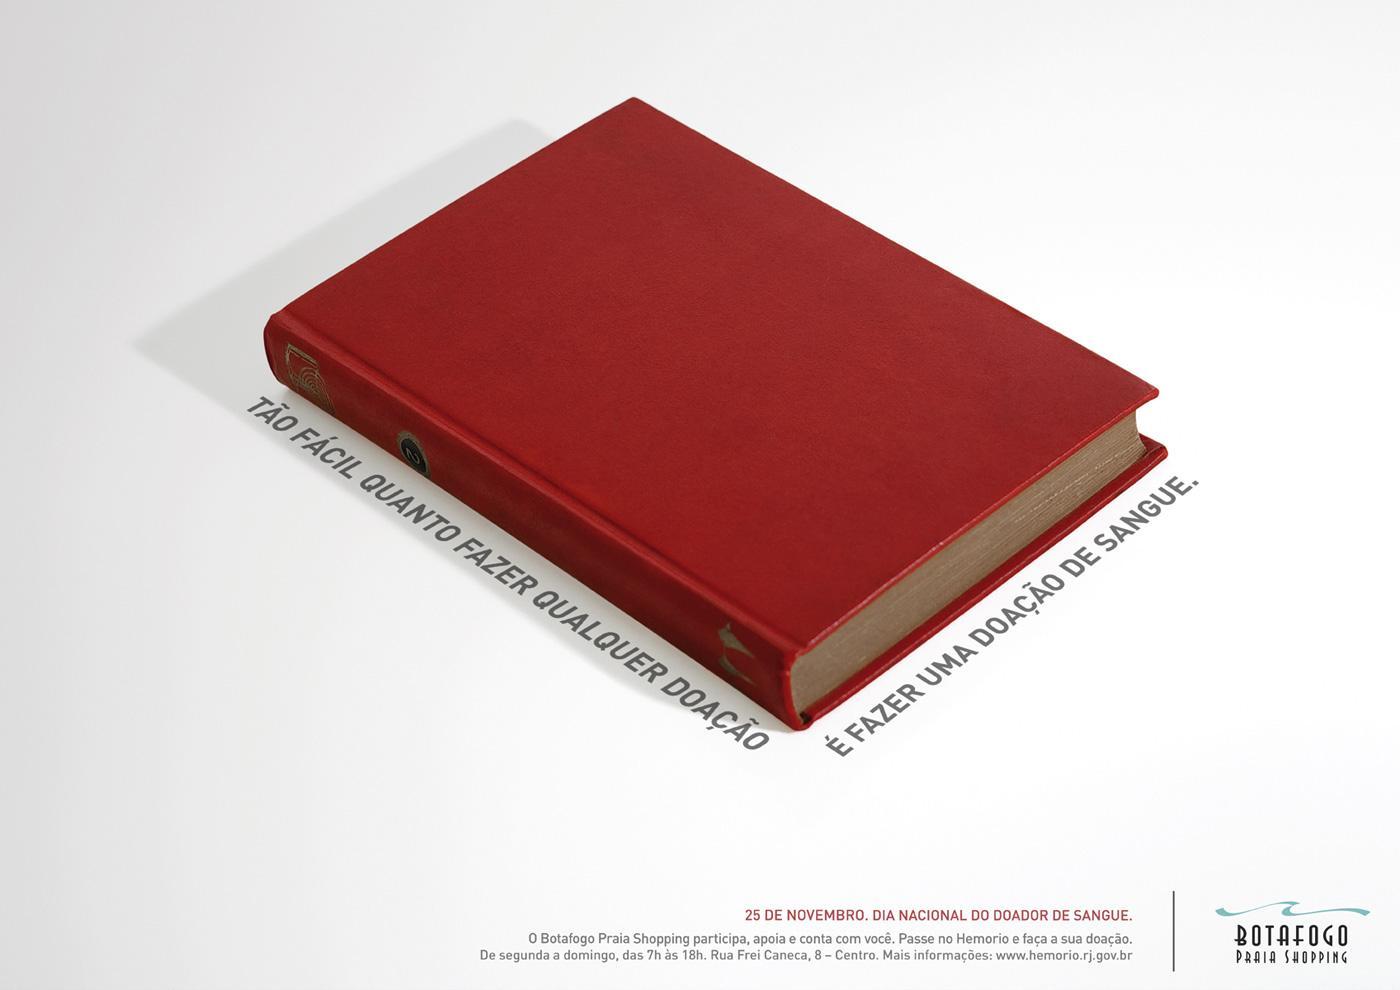 Botafogo Praia Shopping Print Ad -  Donate Blood, Book